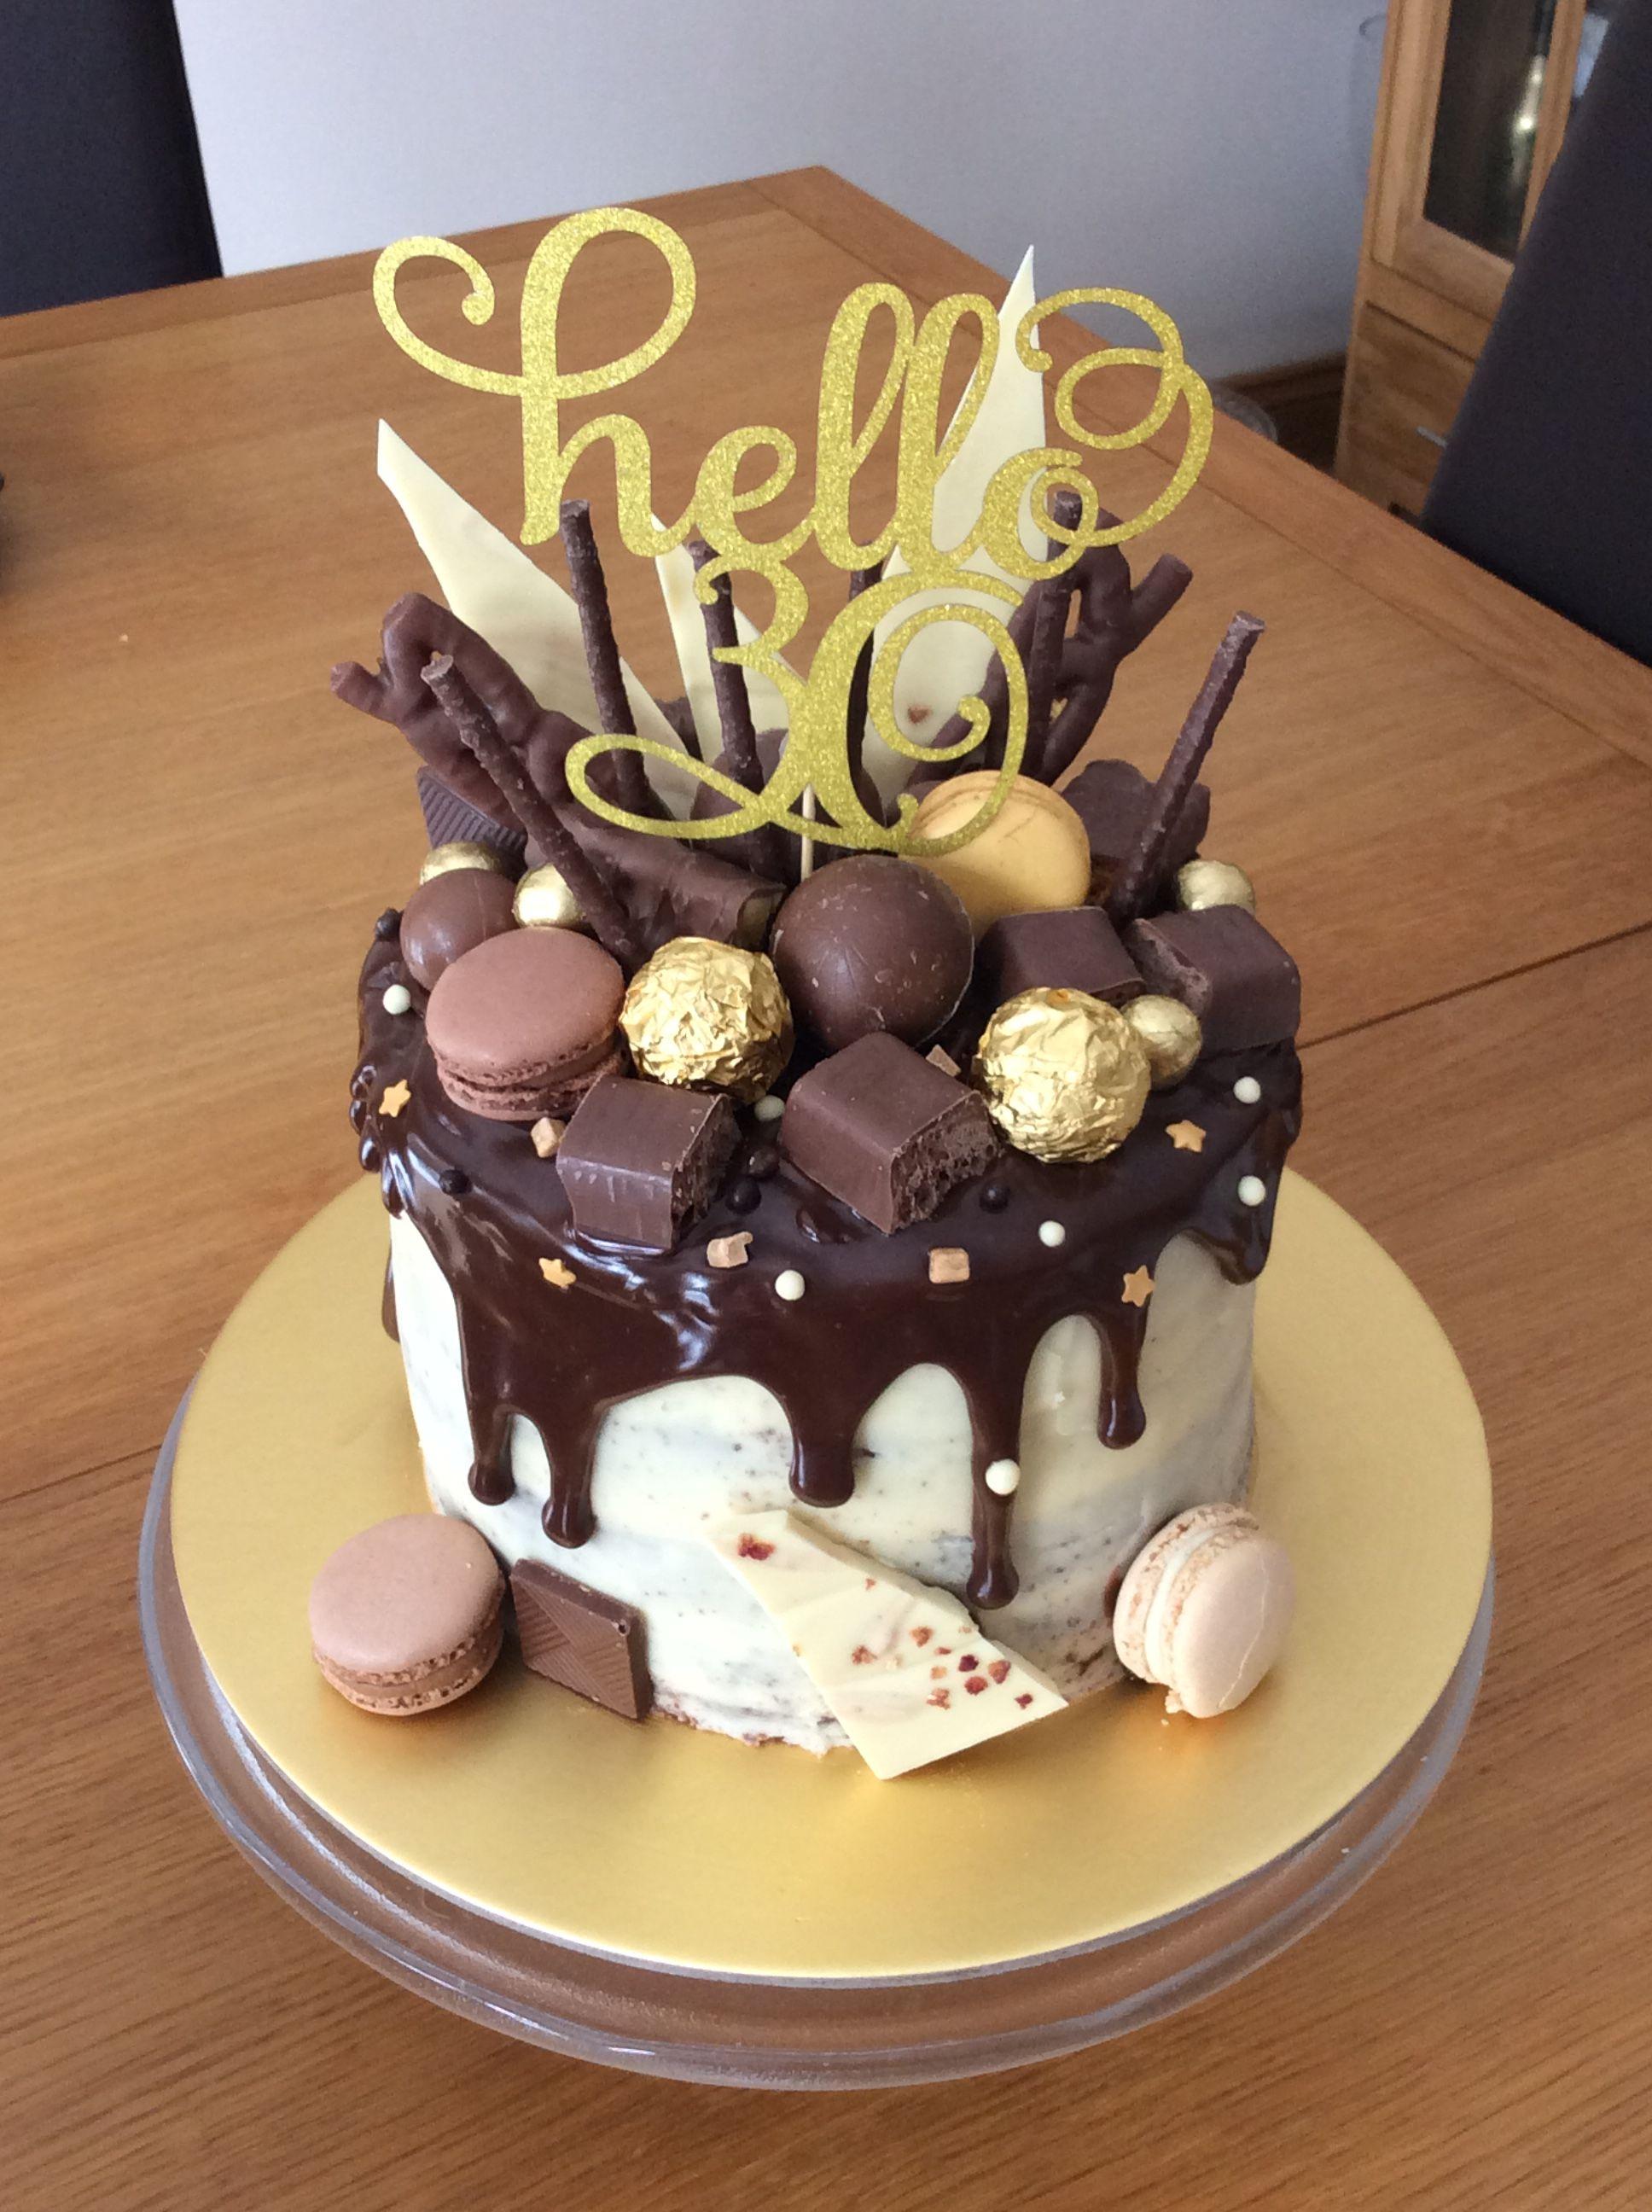 30th birthday drip cake 21st birthday cakes 25th